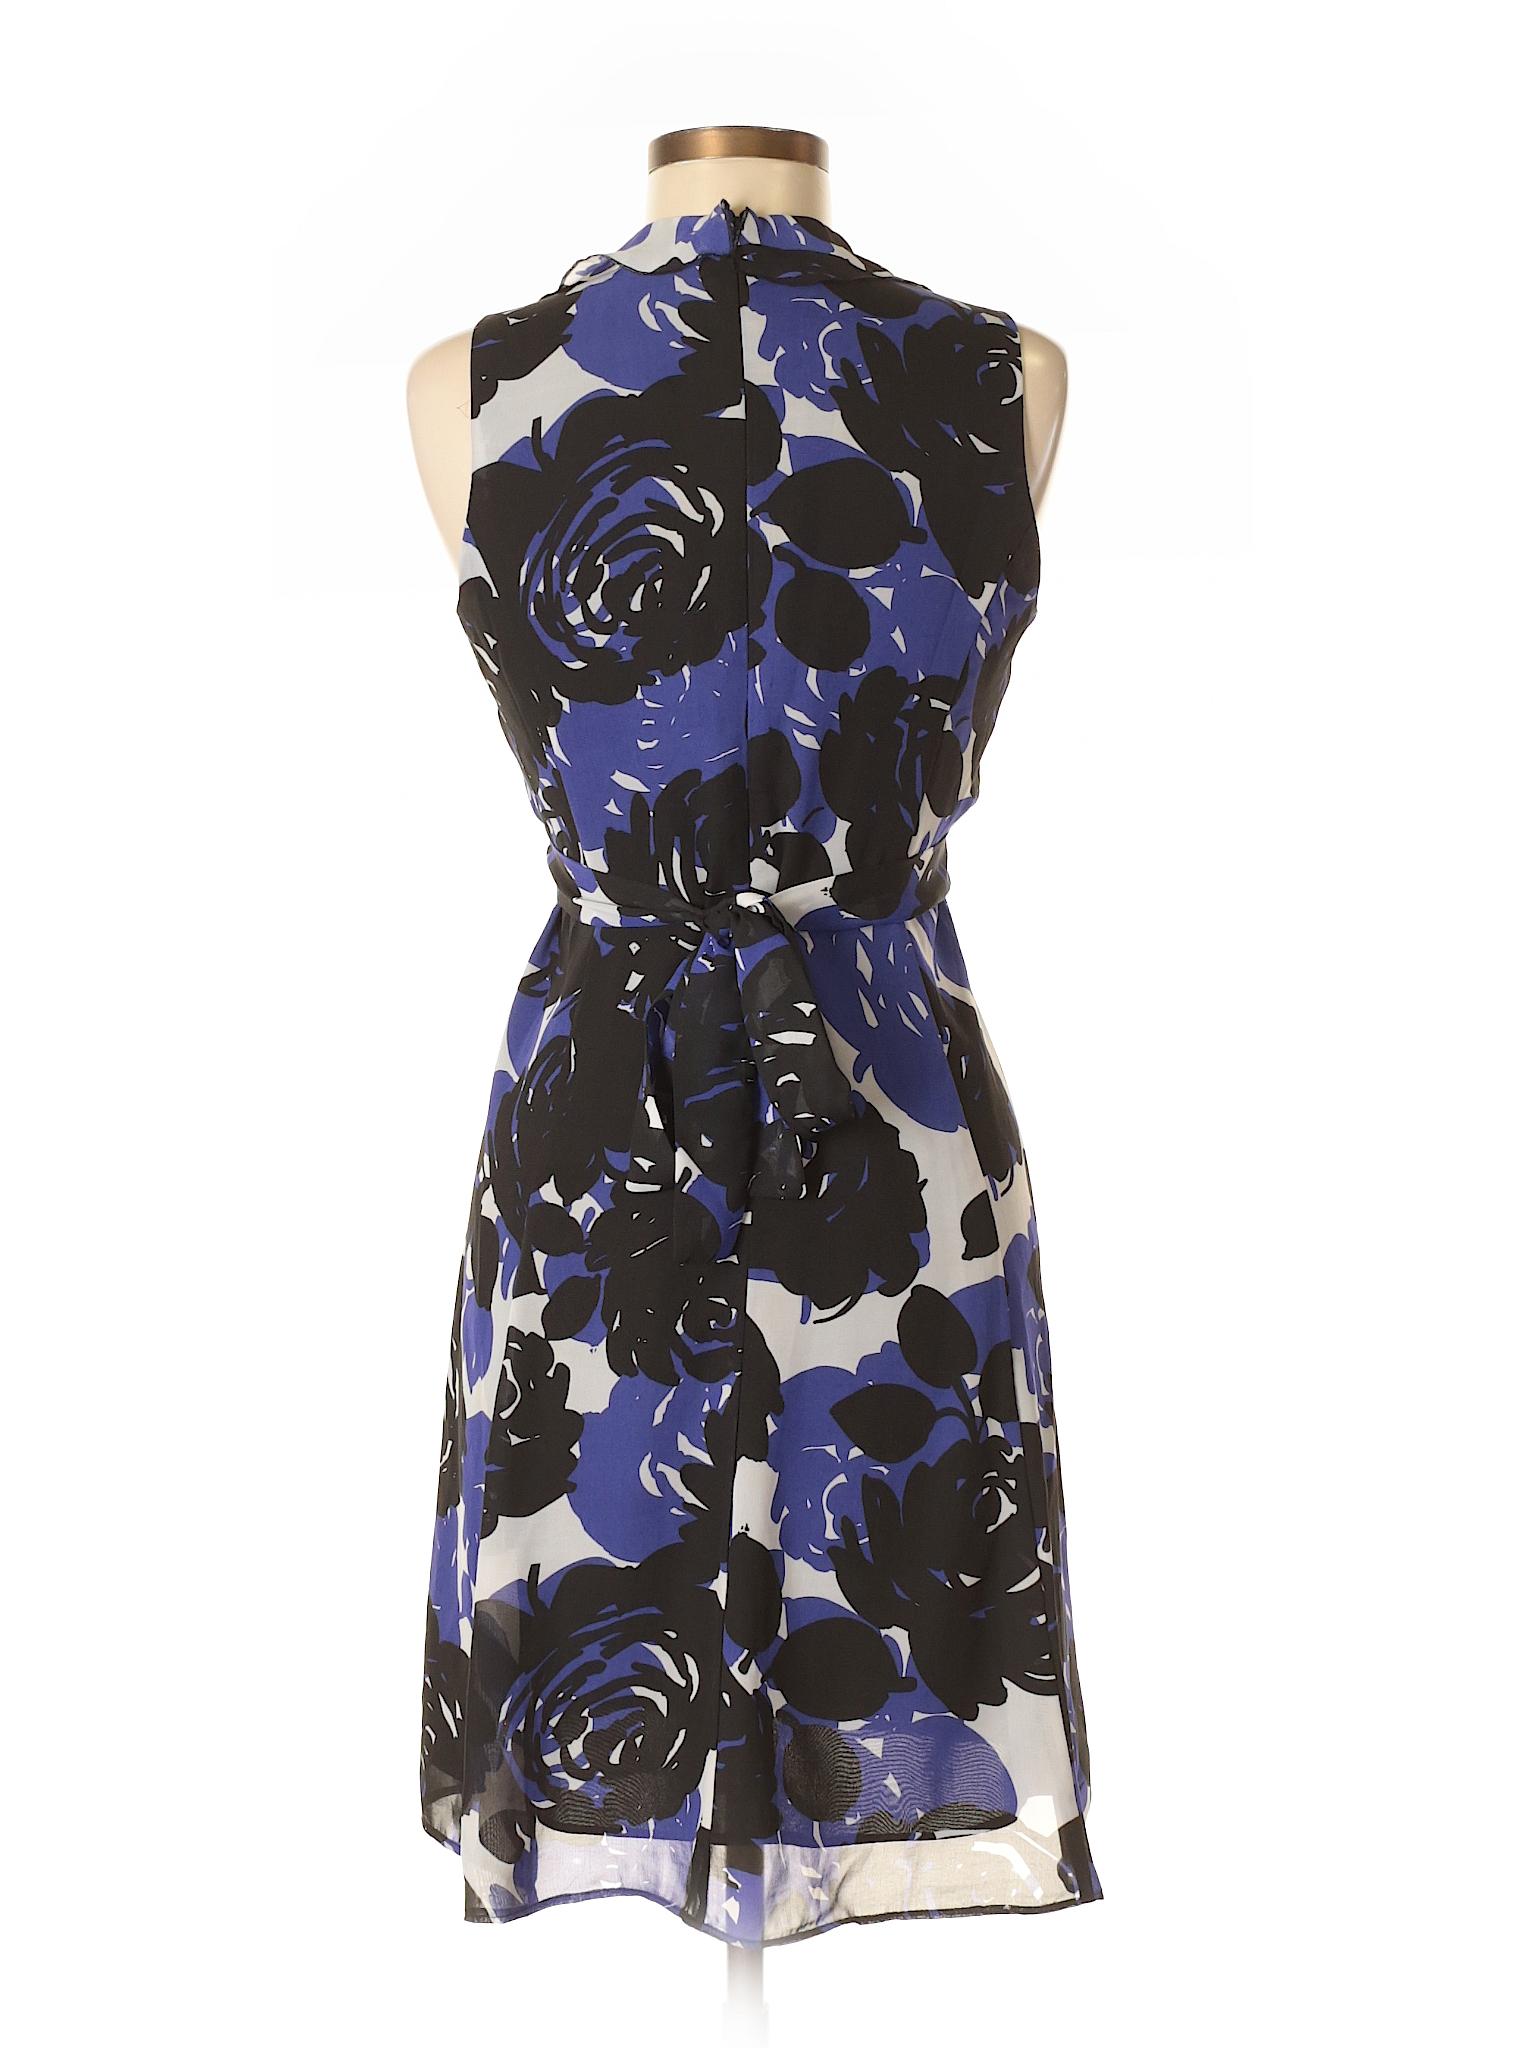 Selling Casual Trulli Dress Trulli Selling Casual Casual Trulli Selling Dress wZqYAqv